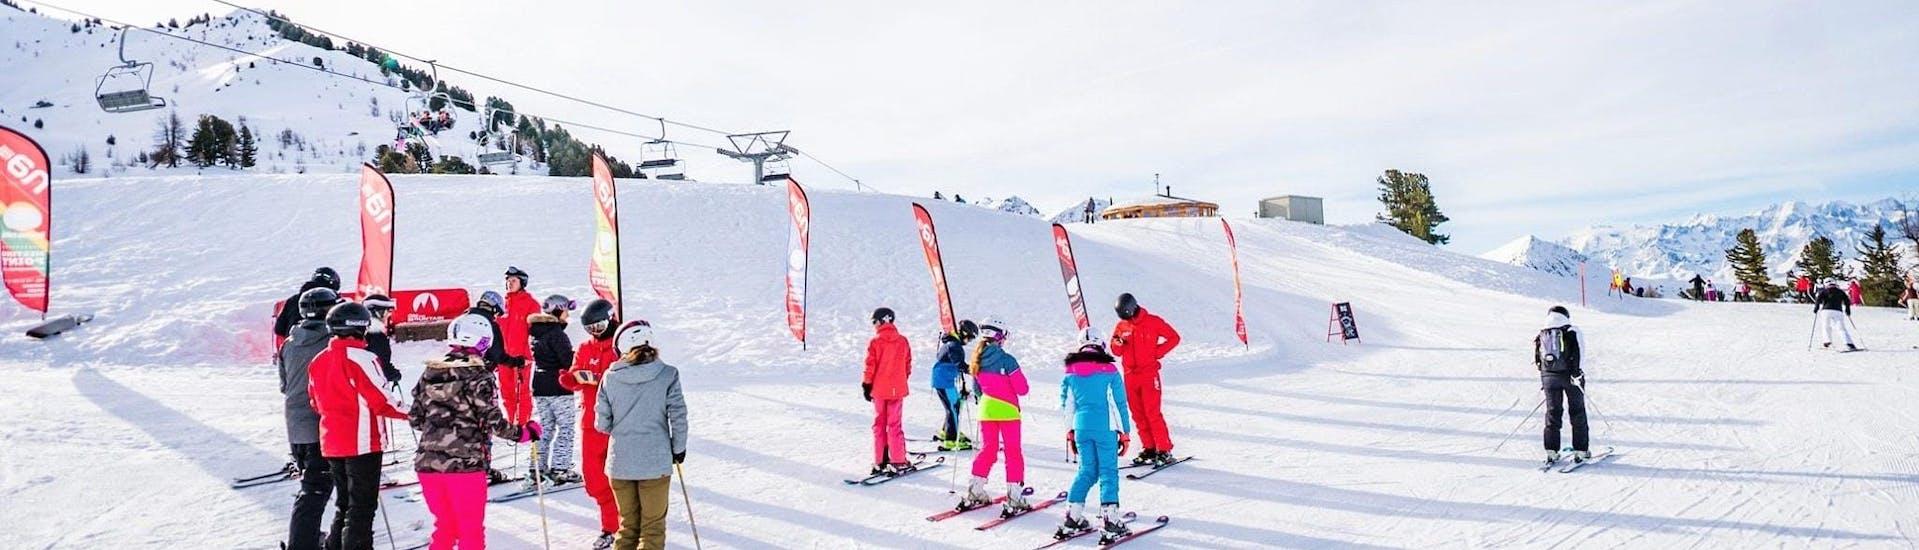 adult-ski-lessons-neige-aventure-hero